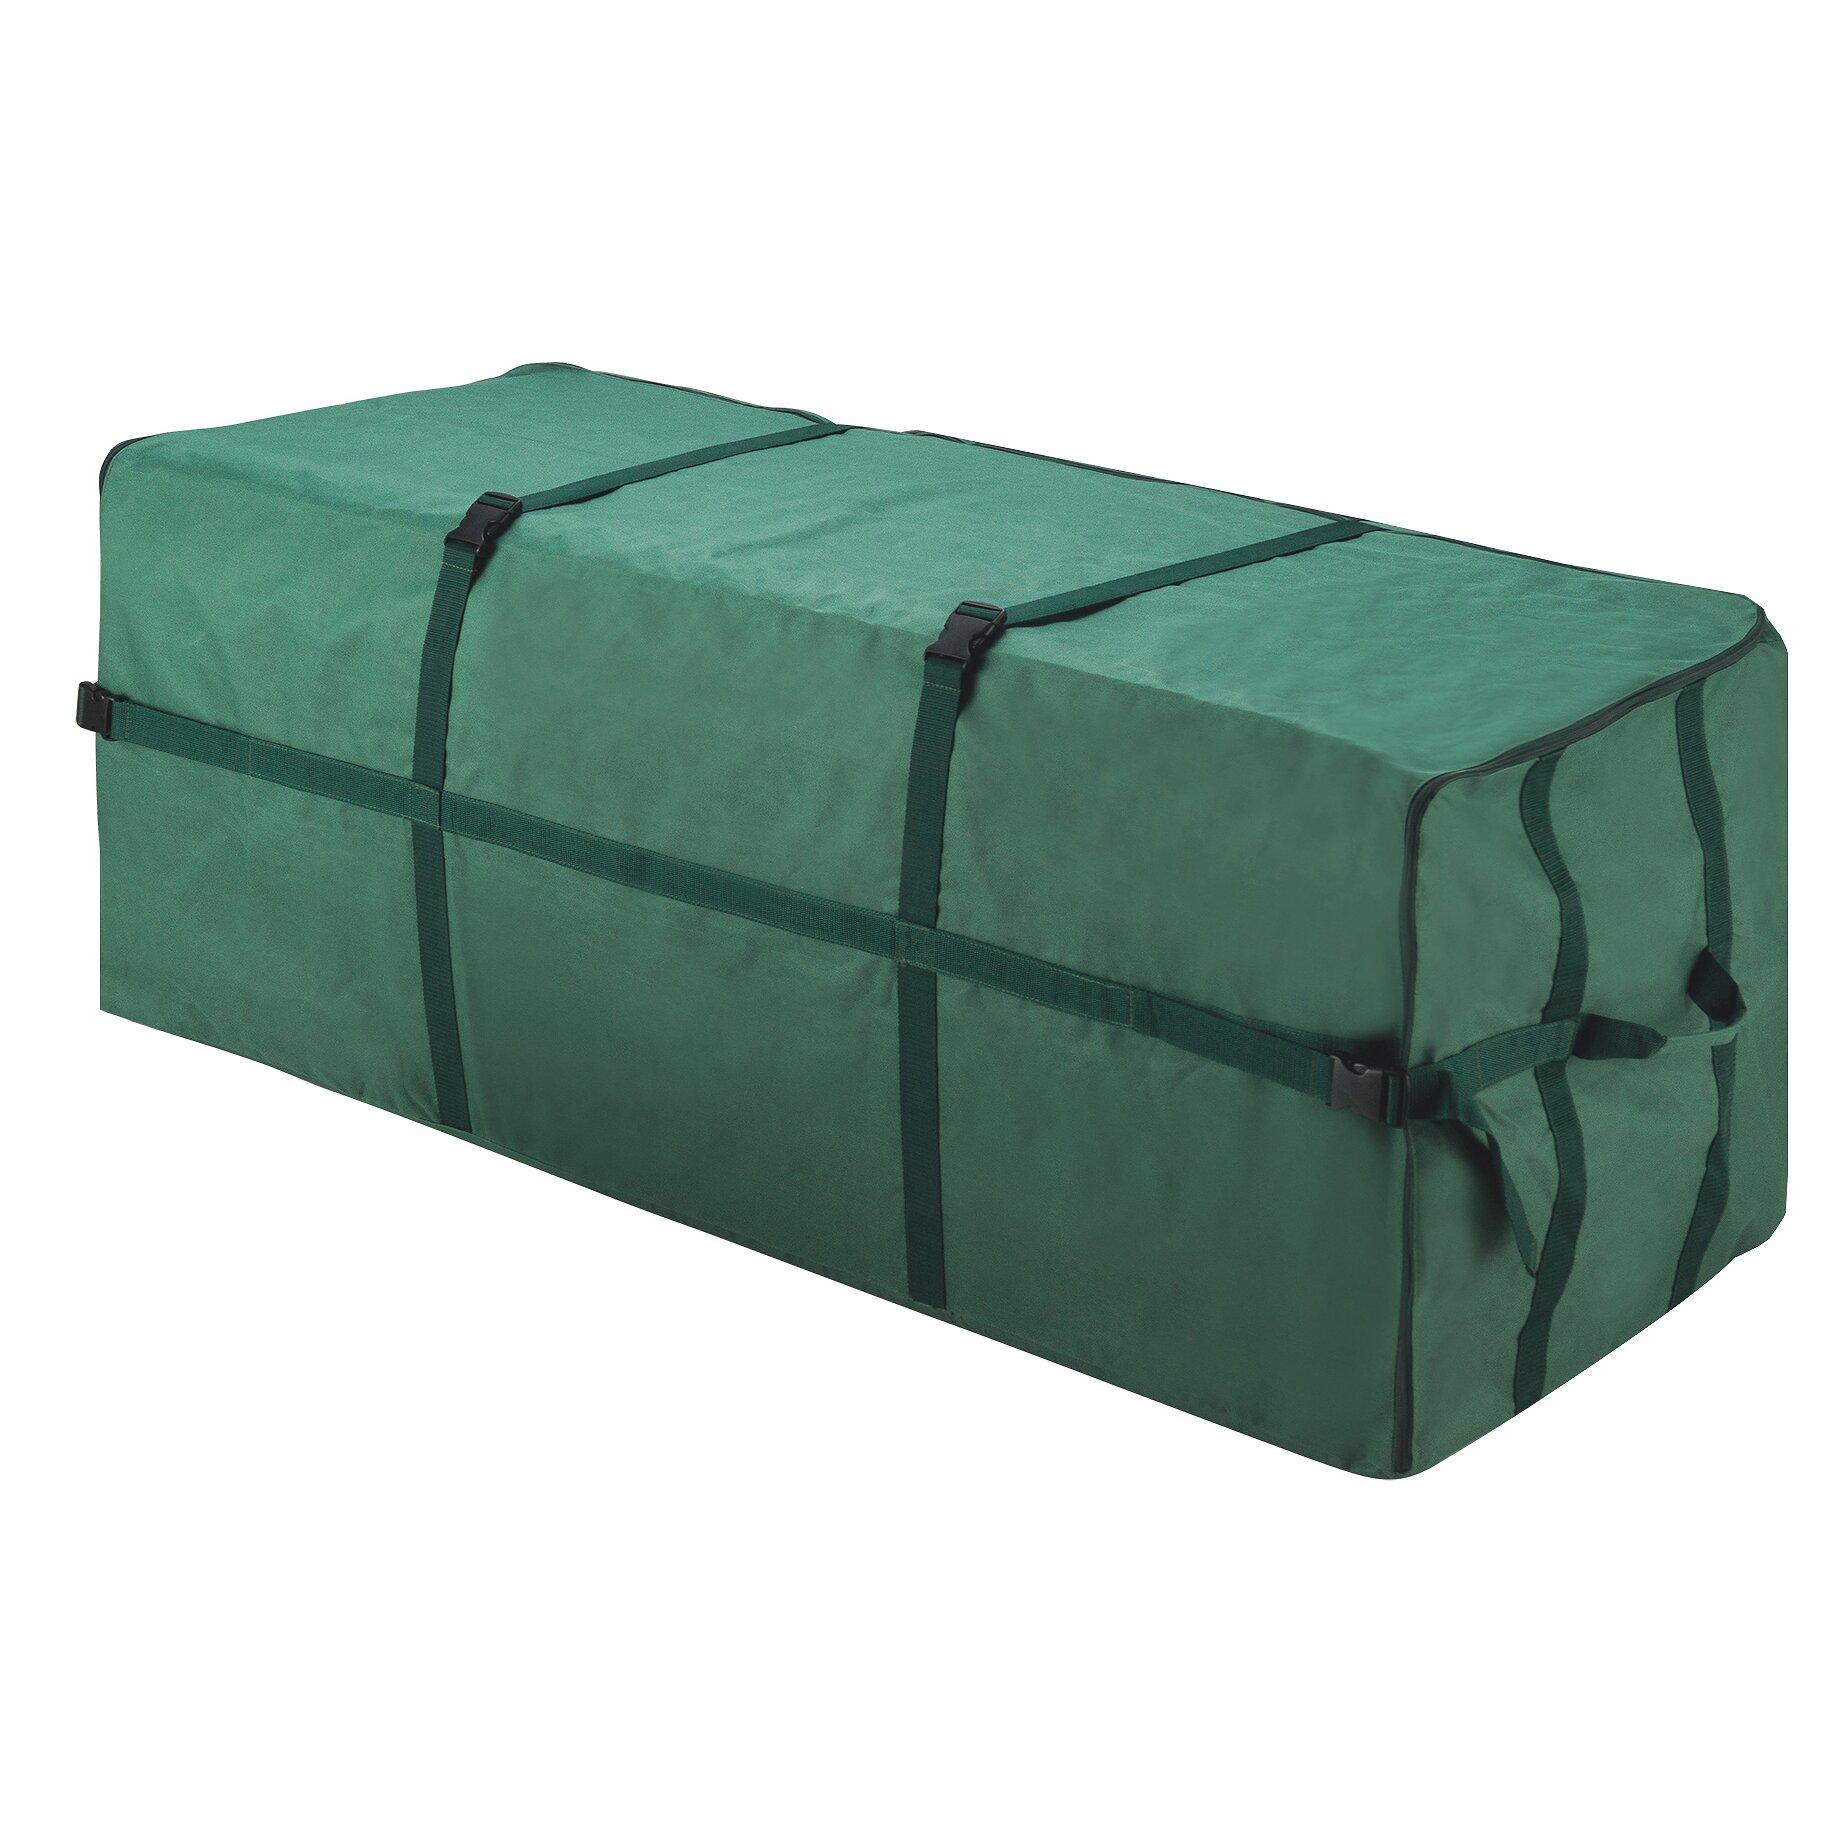 Storage bags for christmas trees - Elf Stor Heavy Duty Canvas Christmas Tree Storage Bag